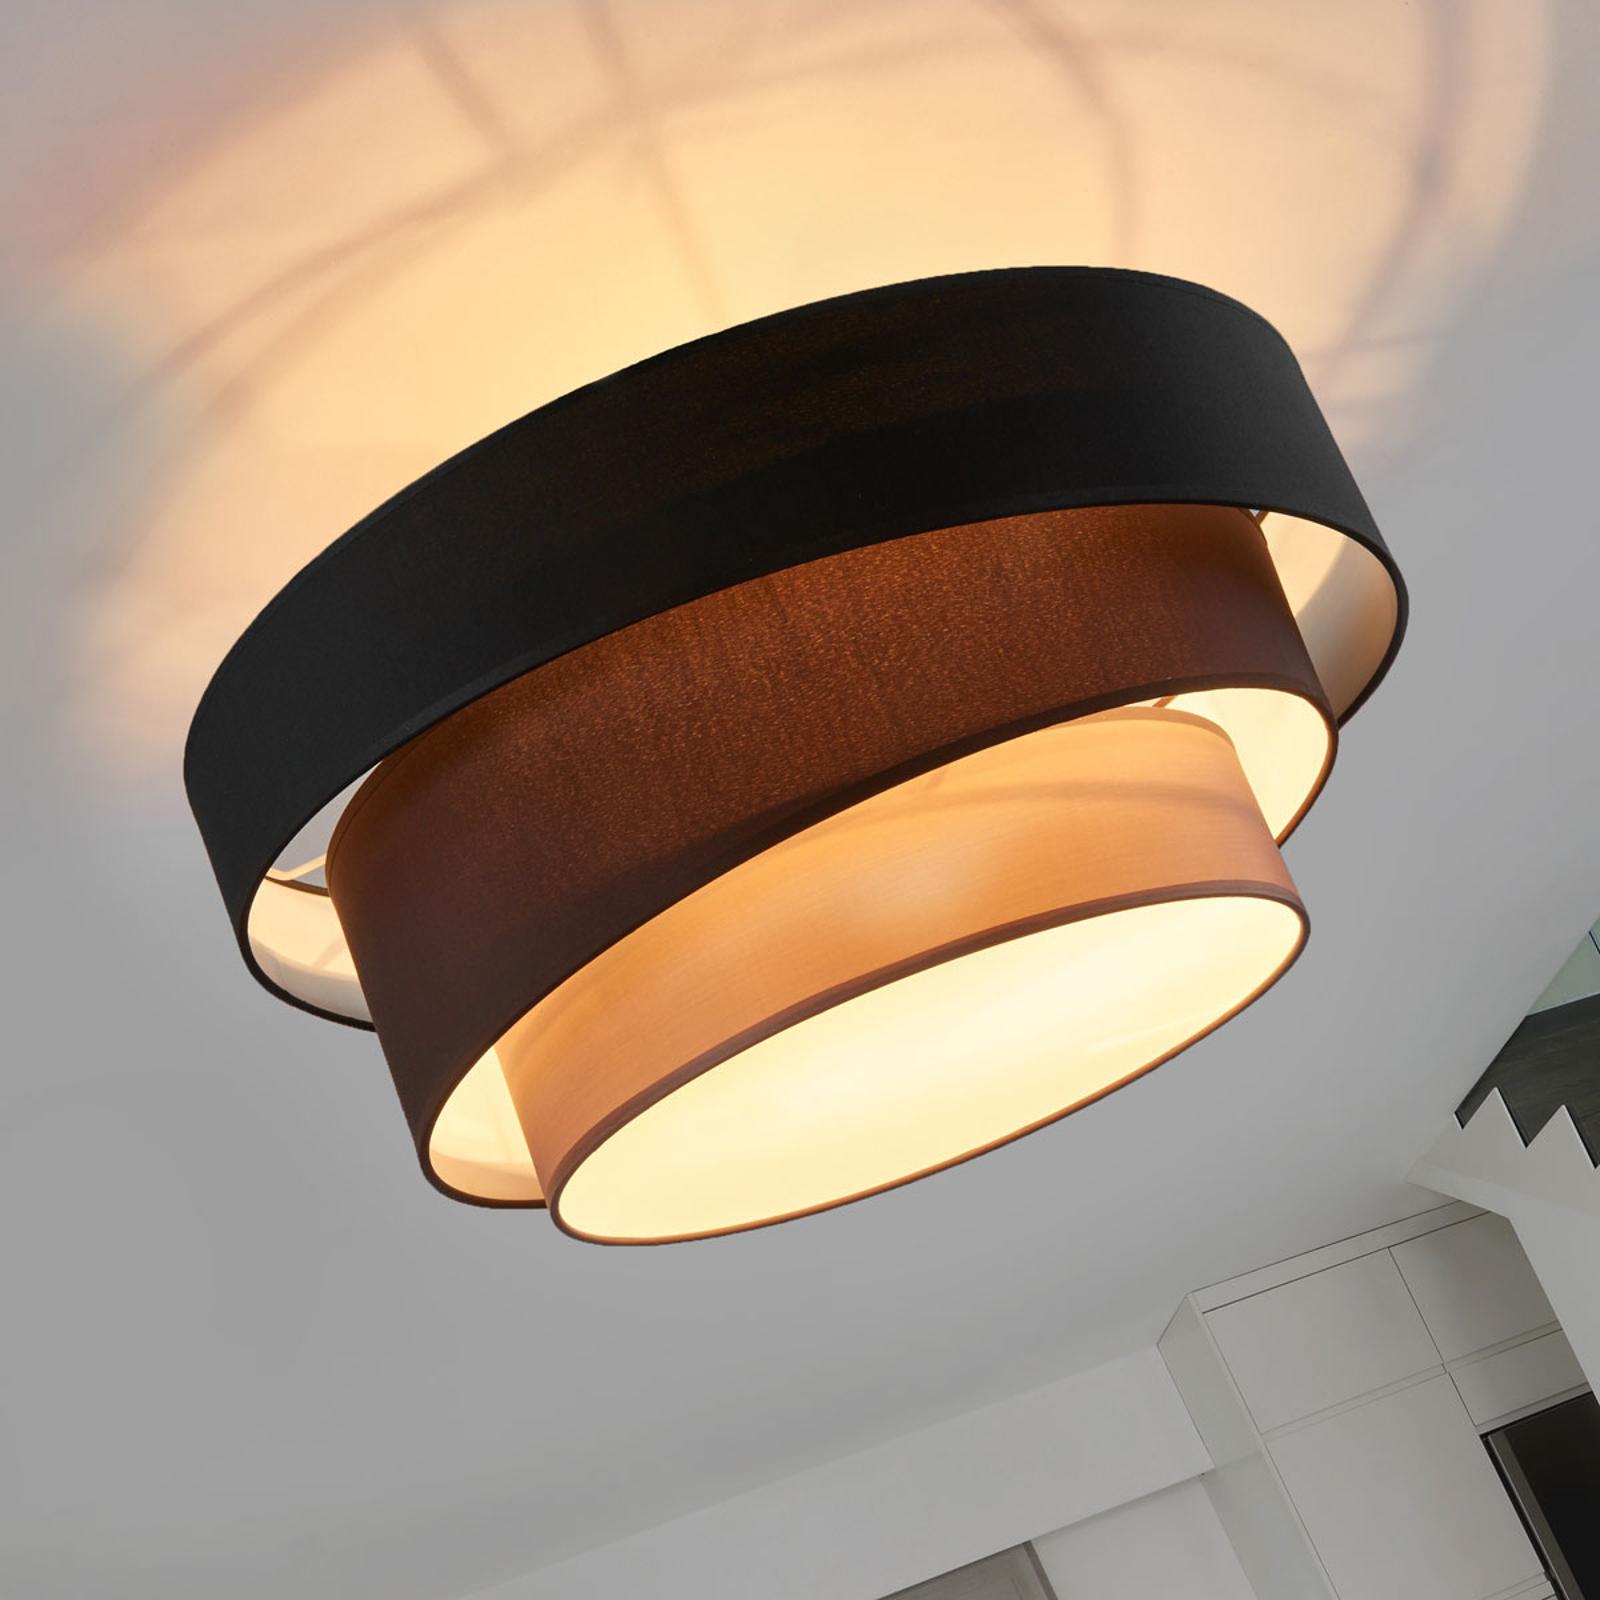 Melia tiltalende svart og brun taklampe